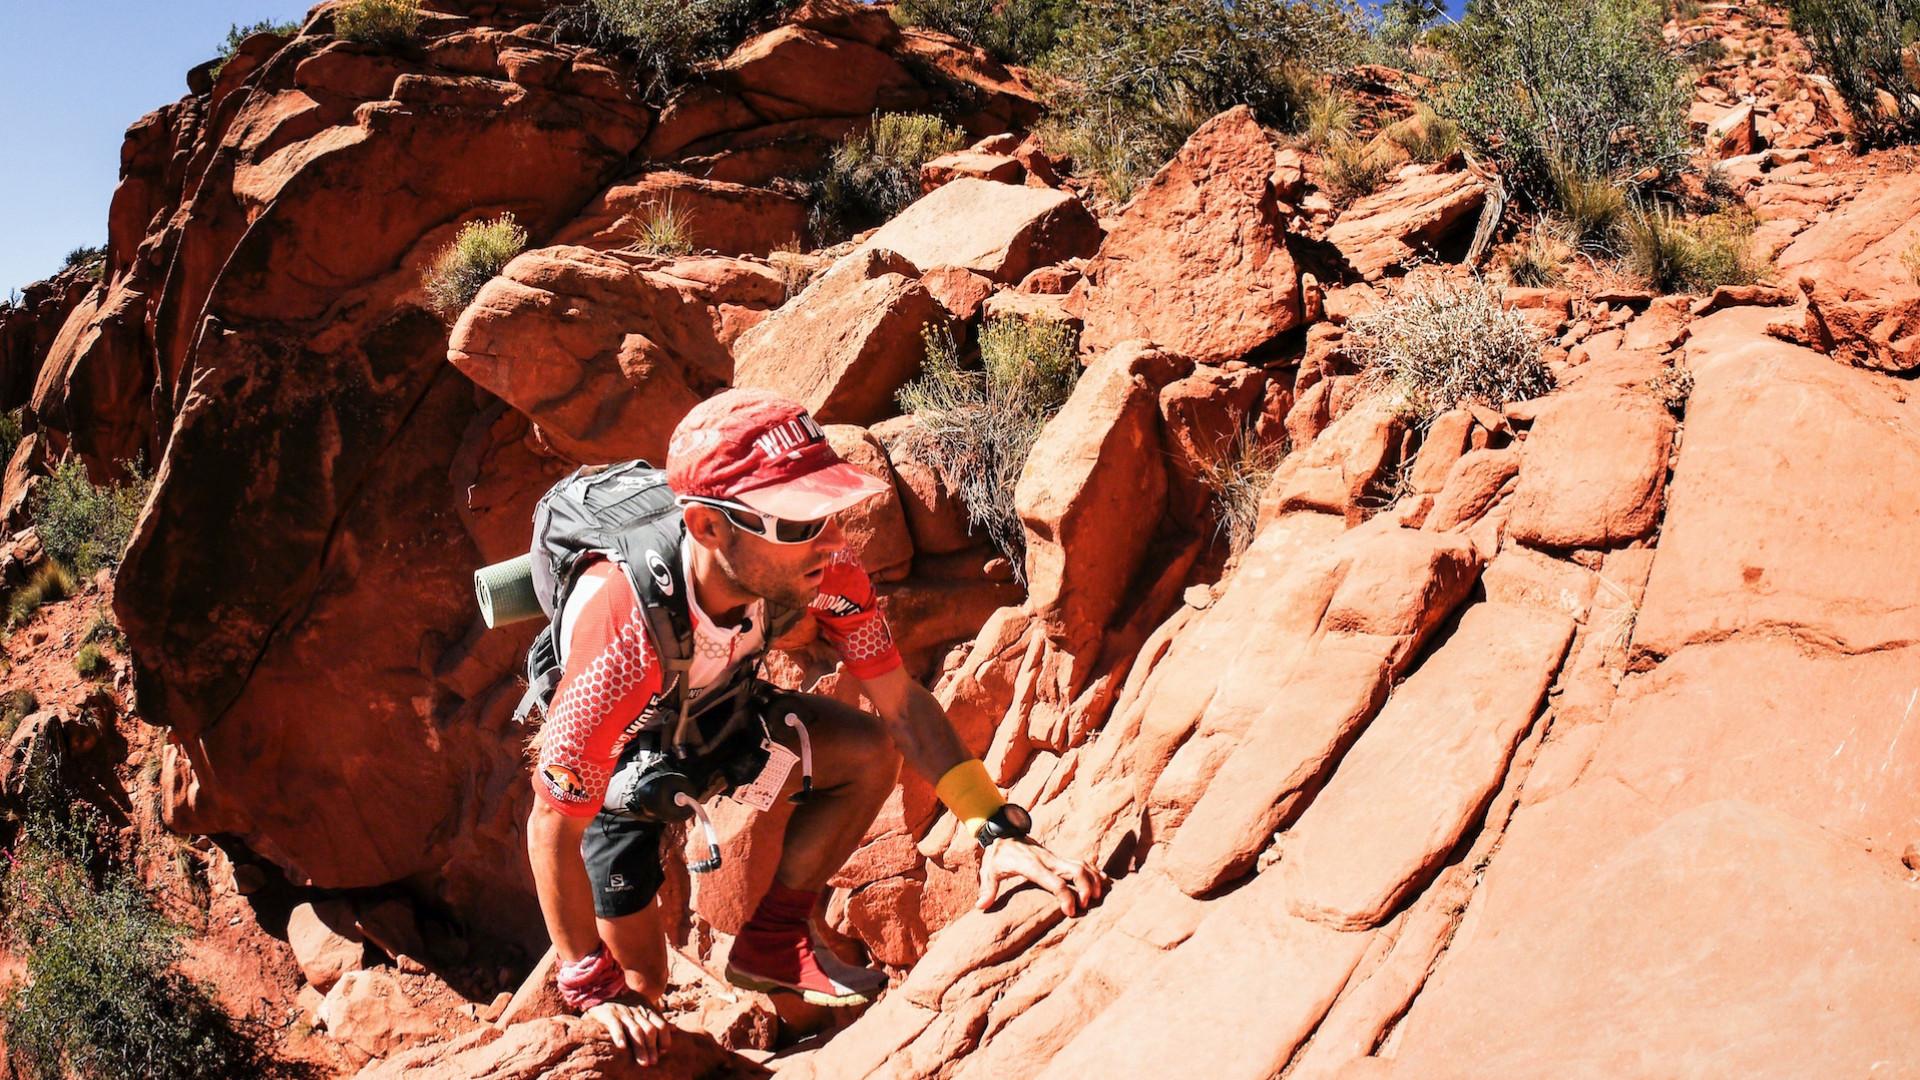 Climbing sandstone on the Grand to Grand run